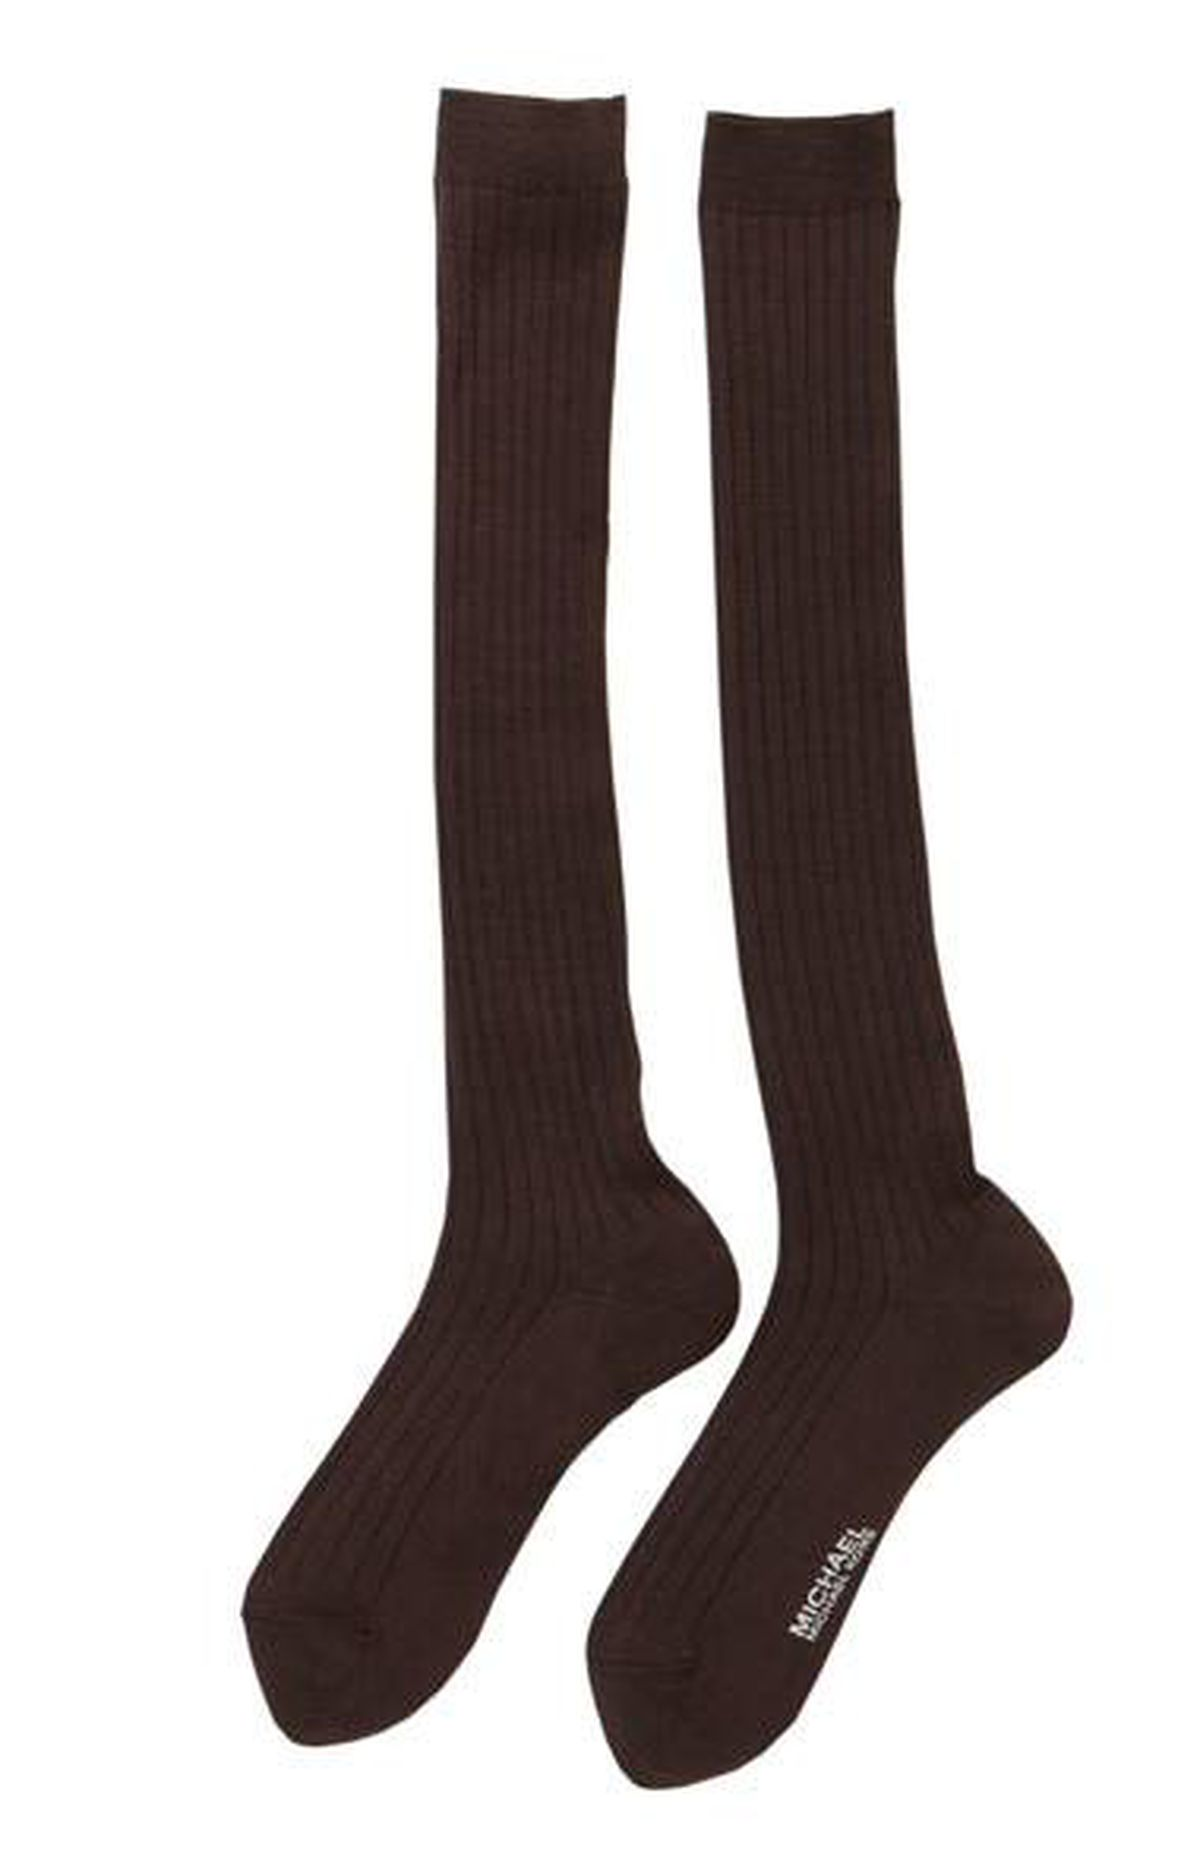 Michael Michael Kors knee socks in Chocolate, $15 at Accessity (www.accessity.com).